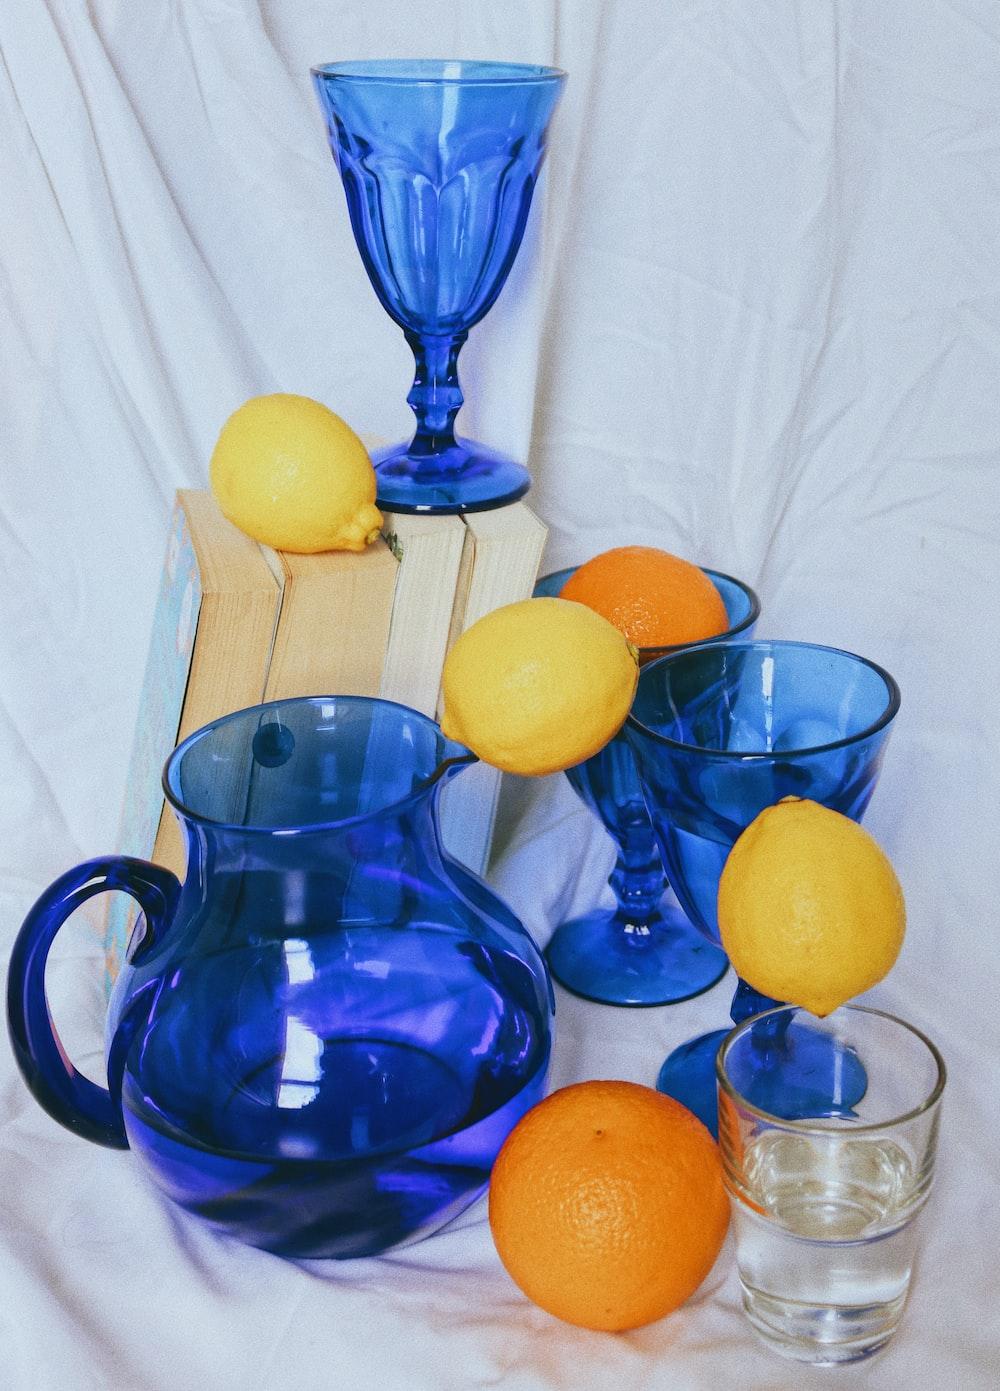 blue glass pitcher with lemon fruits